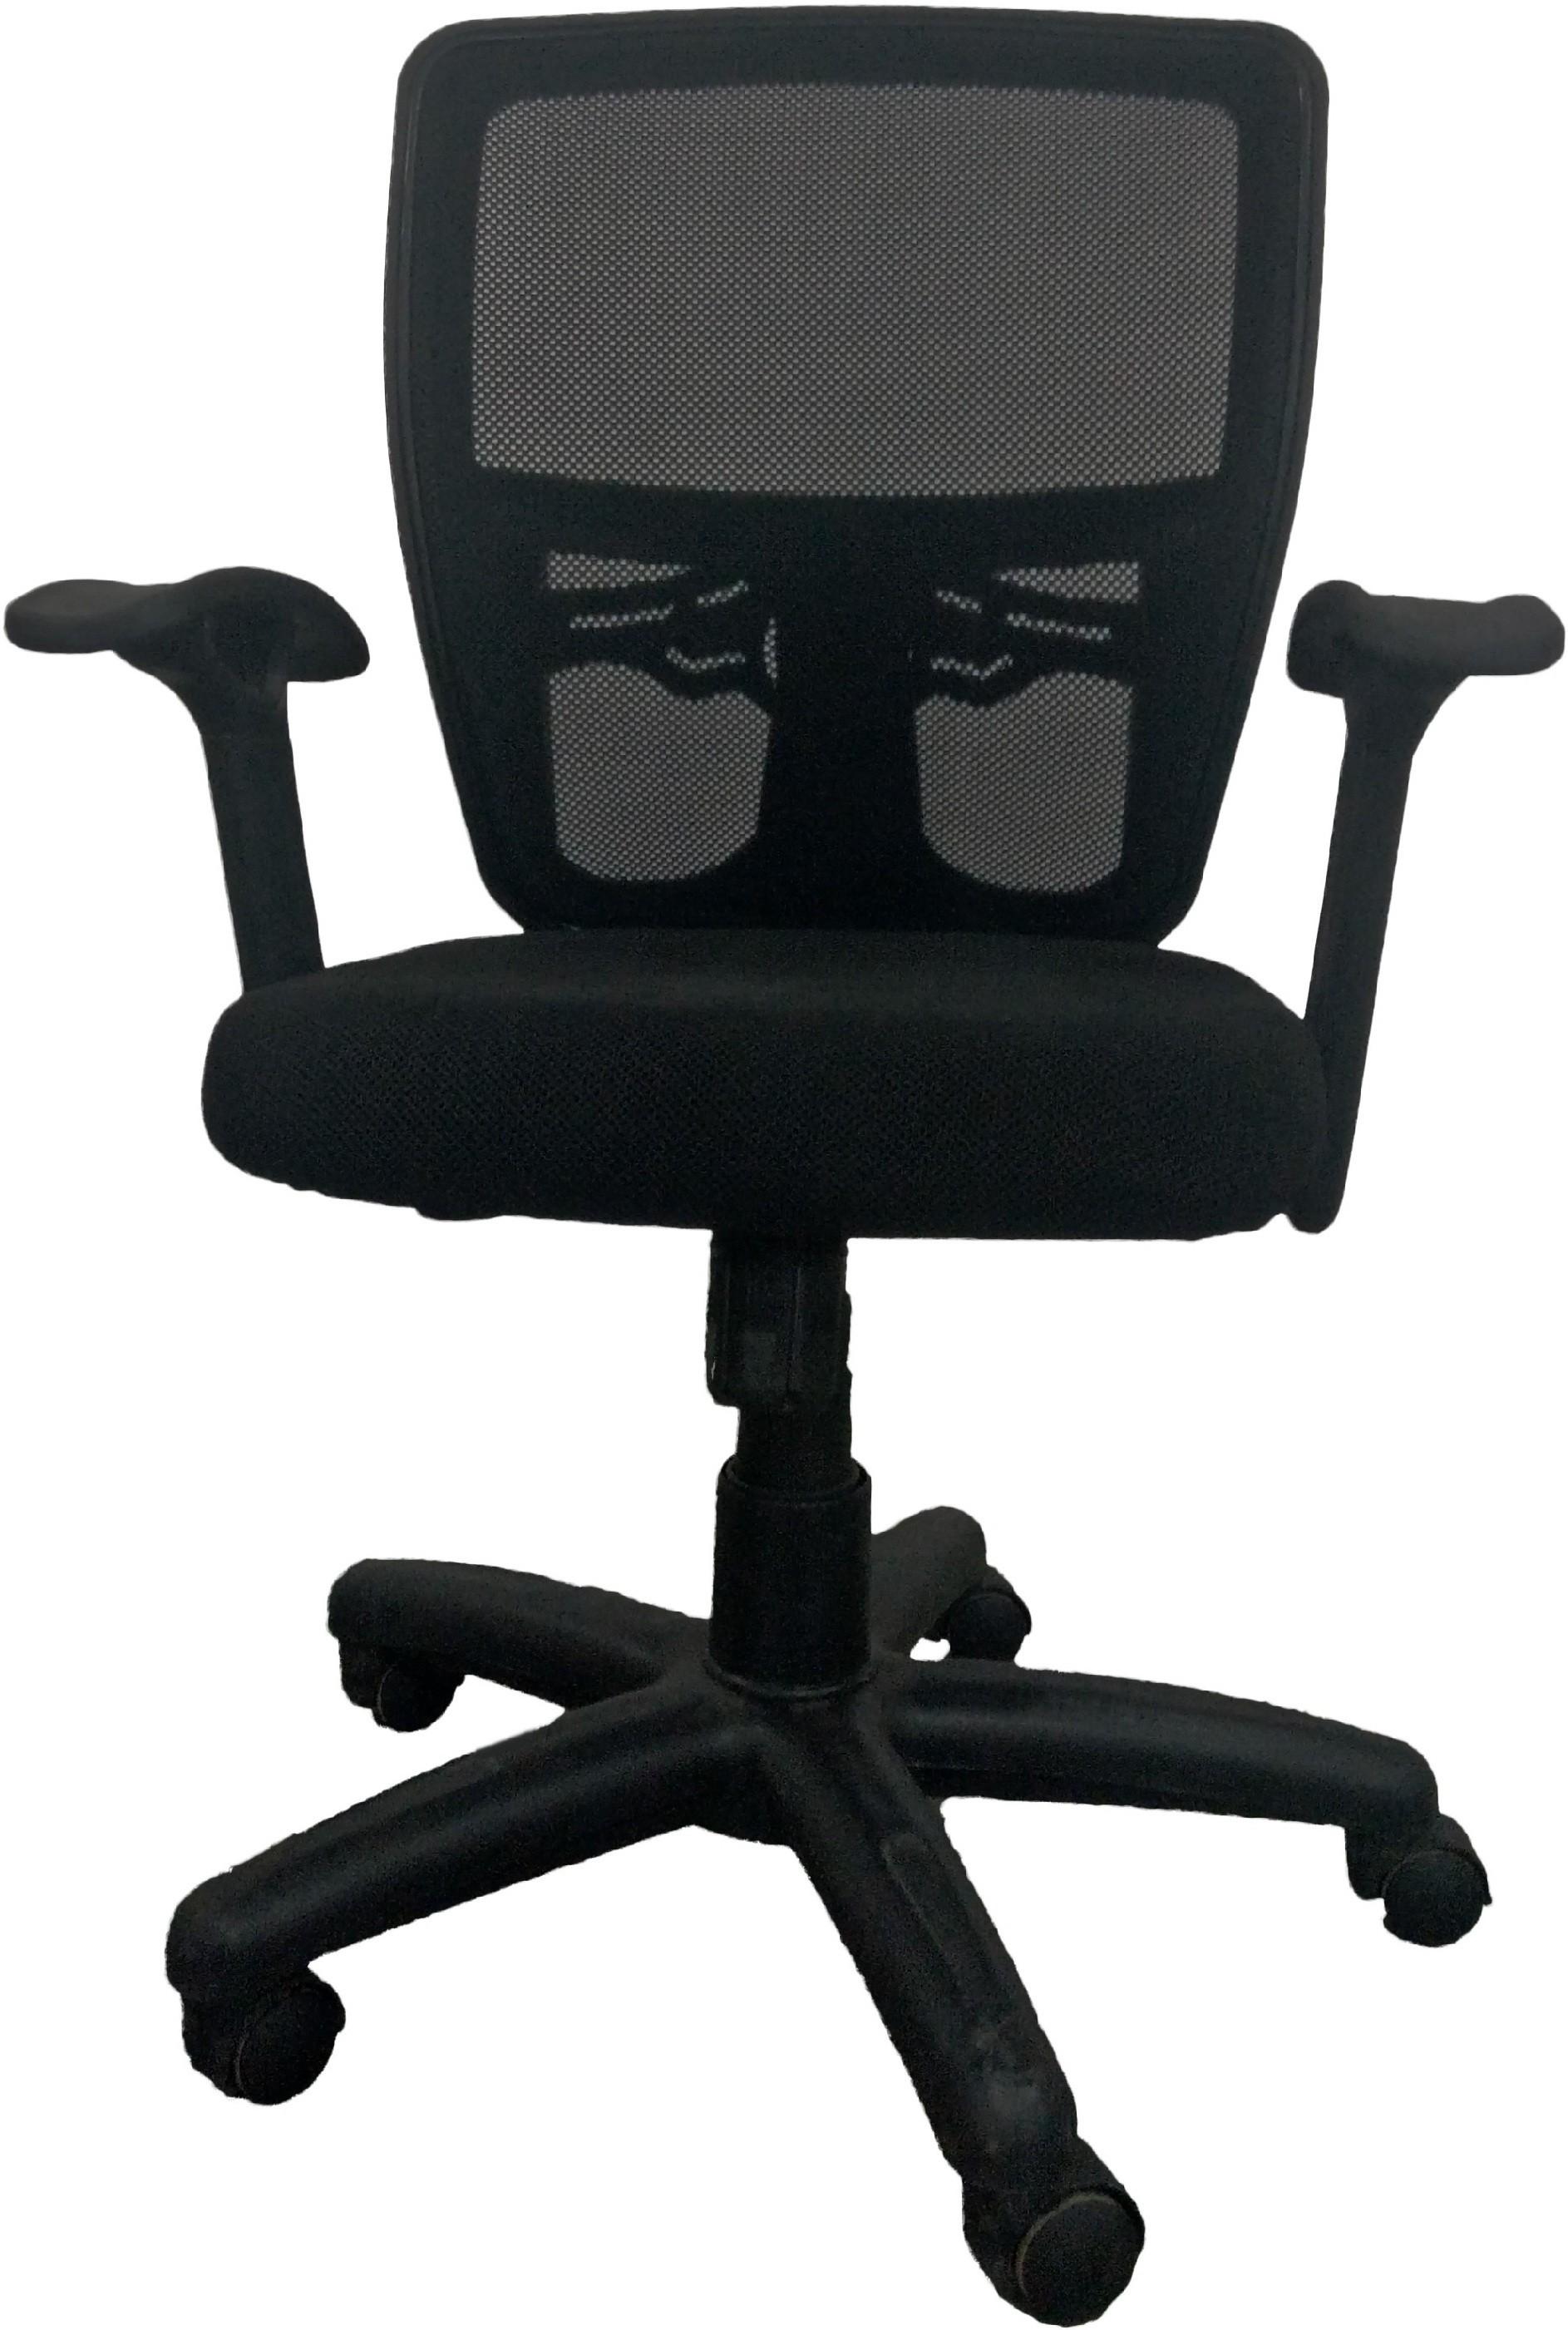 View Sogno Fabric Office Chair(Black) Furniture (Sogno)